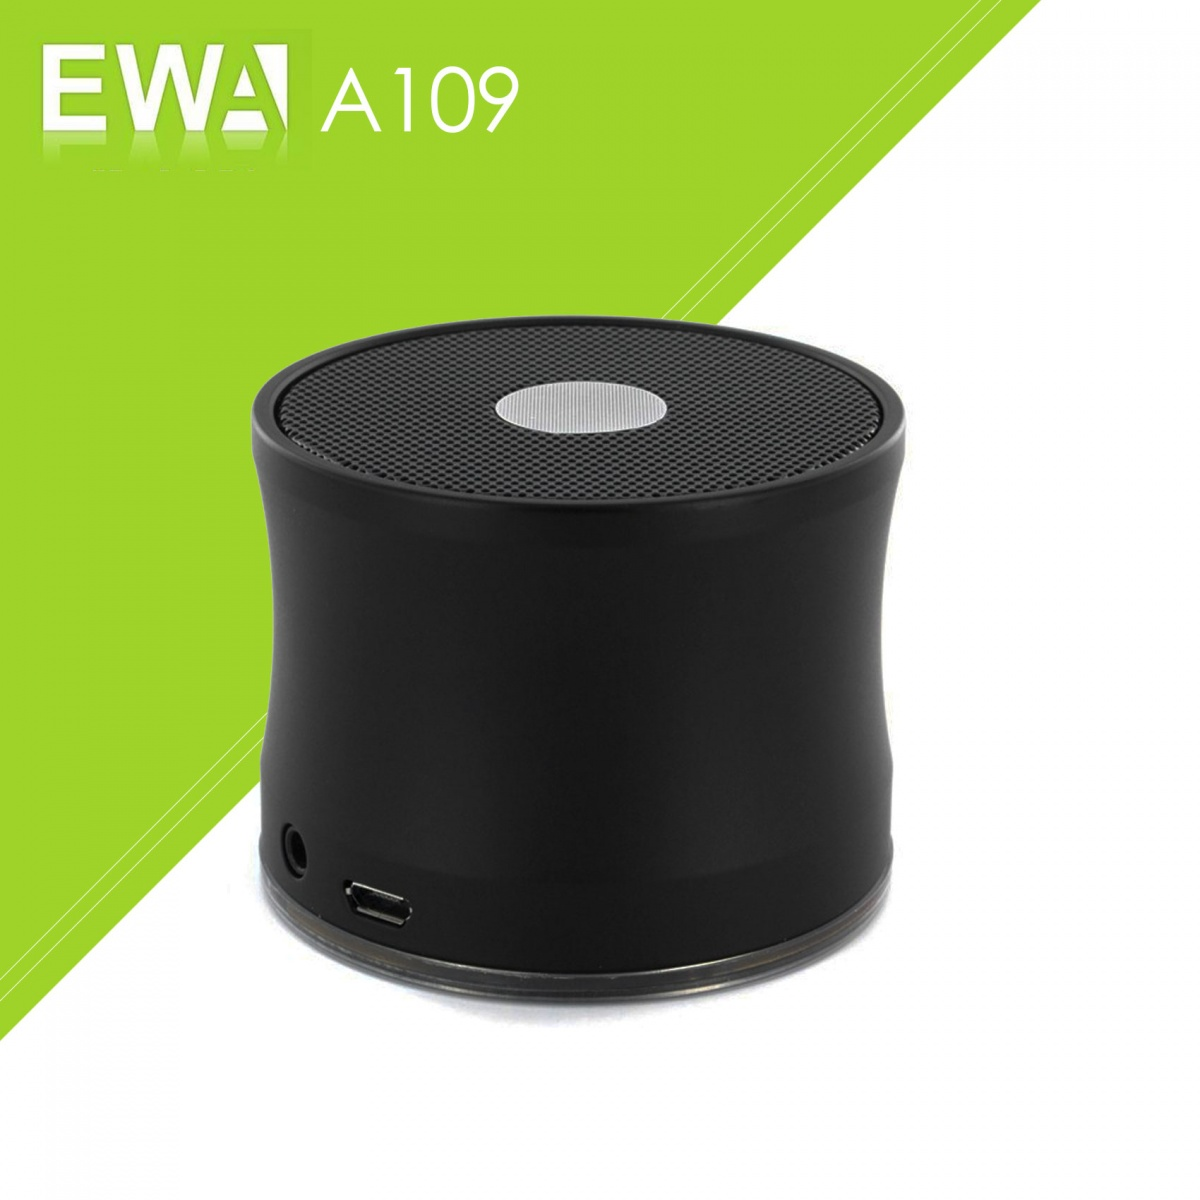 EWA A109 Bluetoothn Speaker - Black